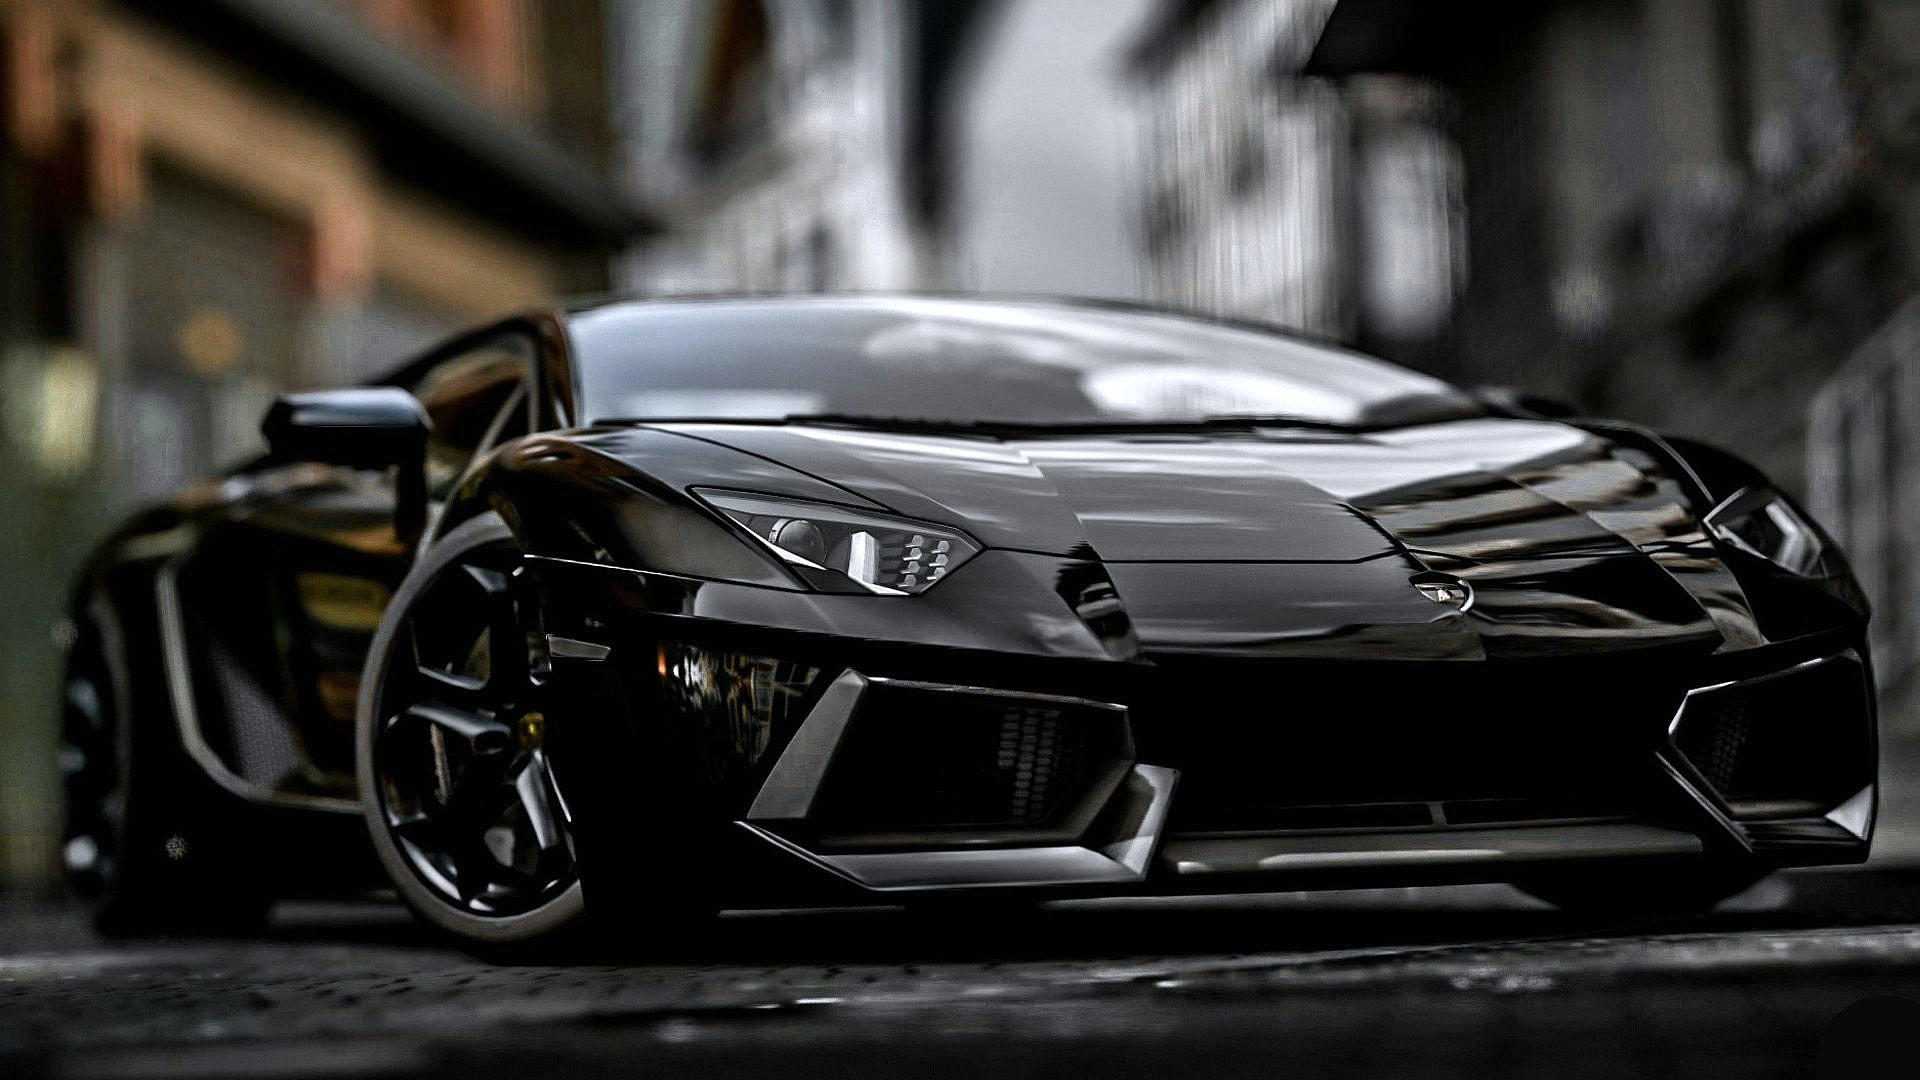 Lamborghini High Resolution Wallpaper ·① WallpaperTag